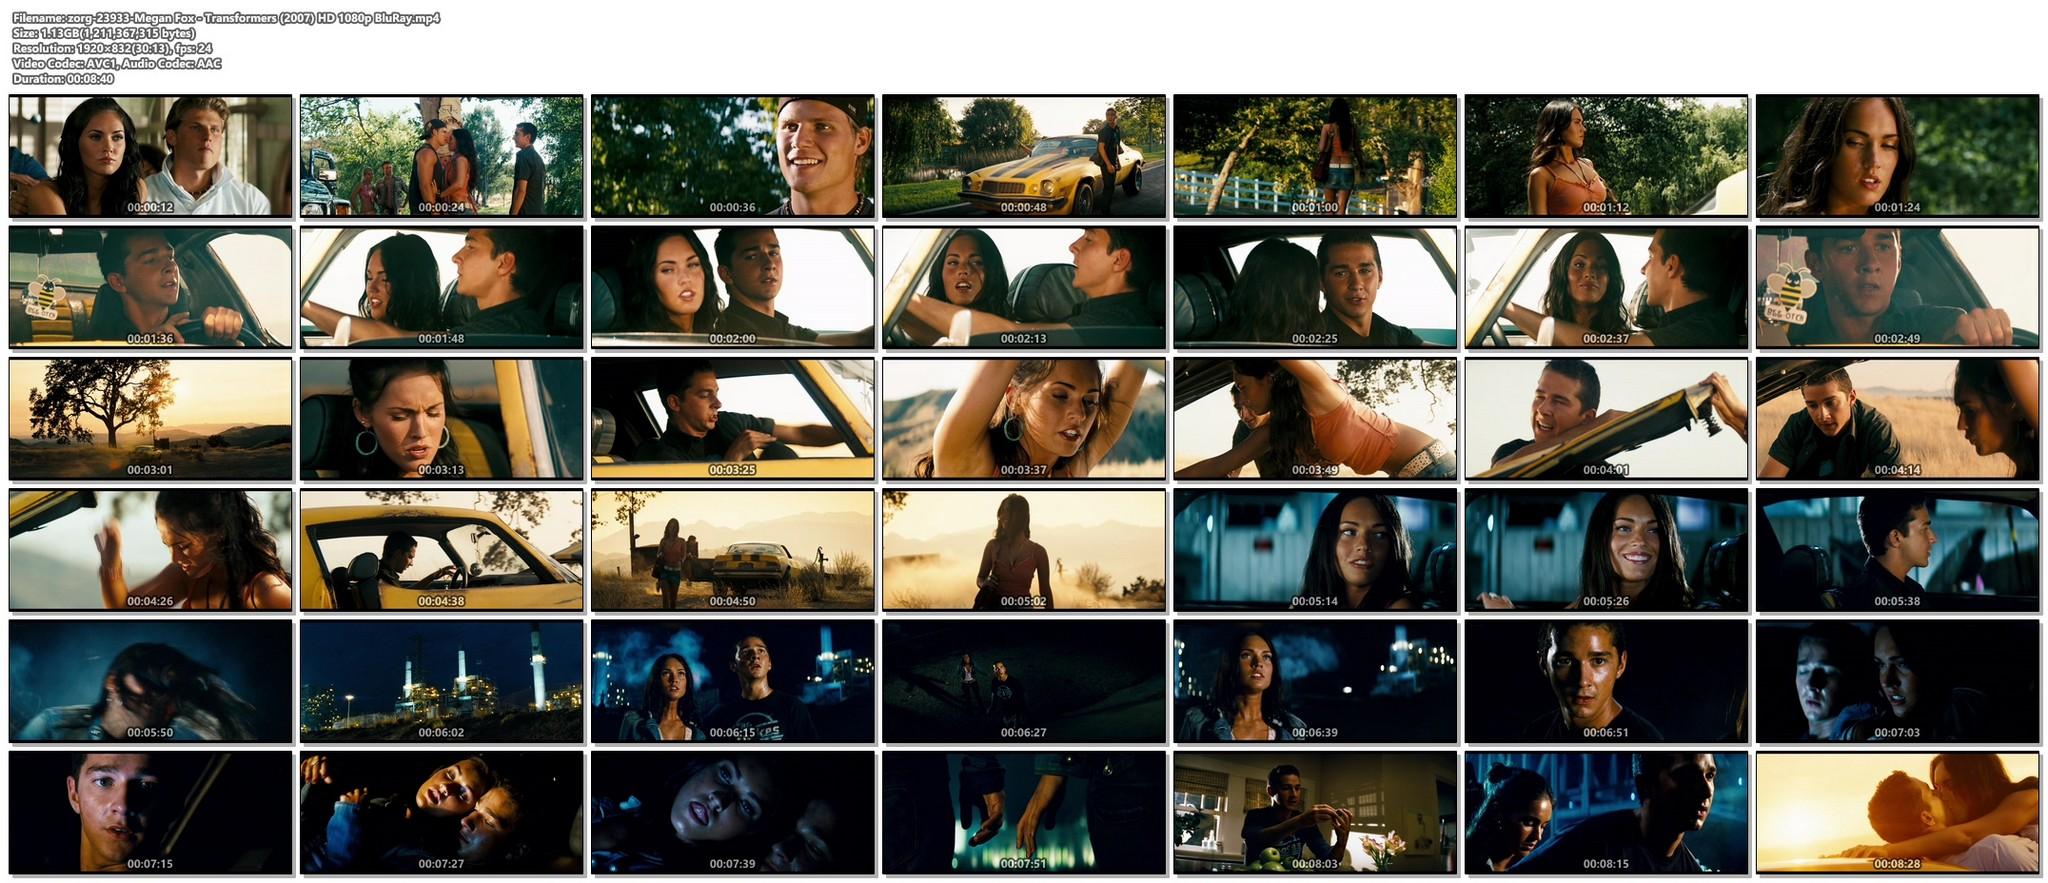 Megan Fox hot and sexy - Transformers (2007) HD 1080p BluRay Remux (1)